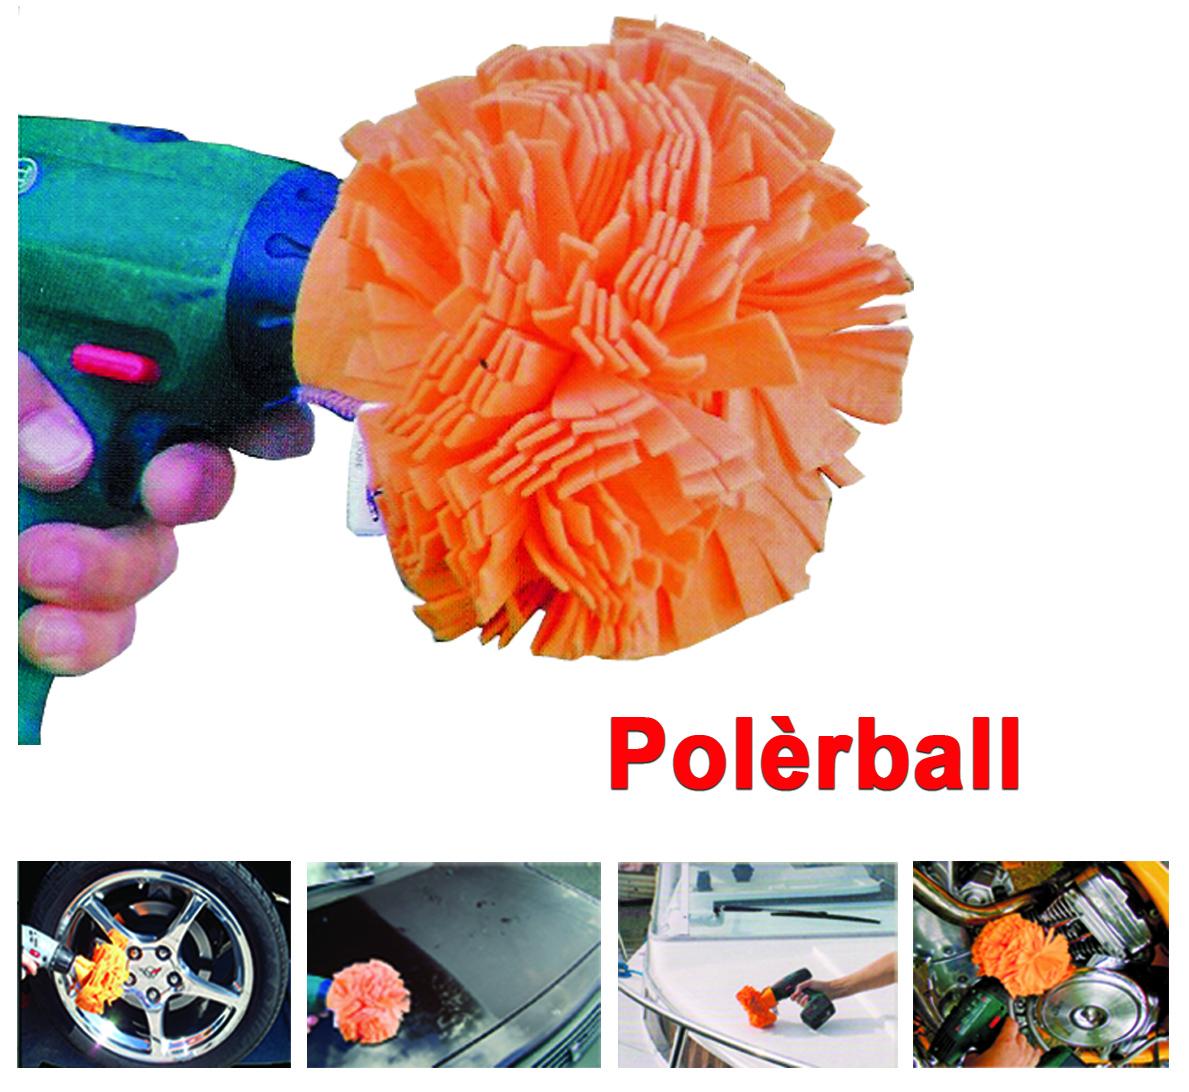 Polerball